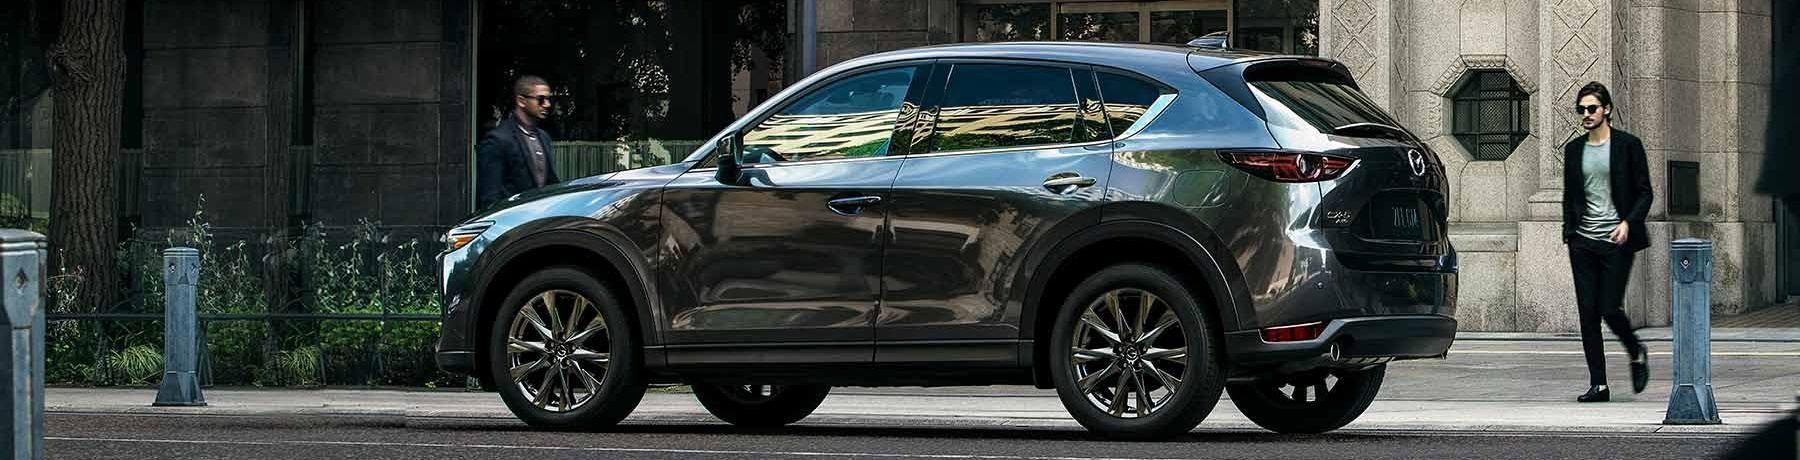 2019 Mazda CX-5 for Sale near Angleton, TX